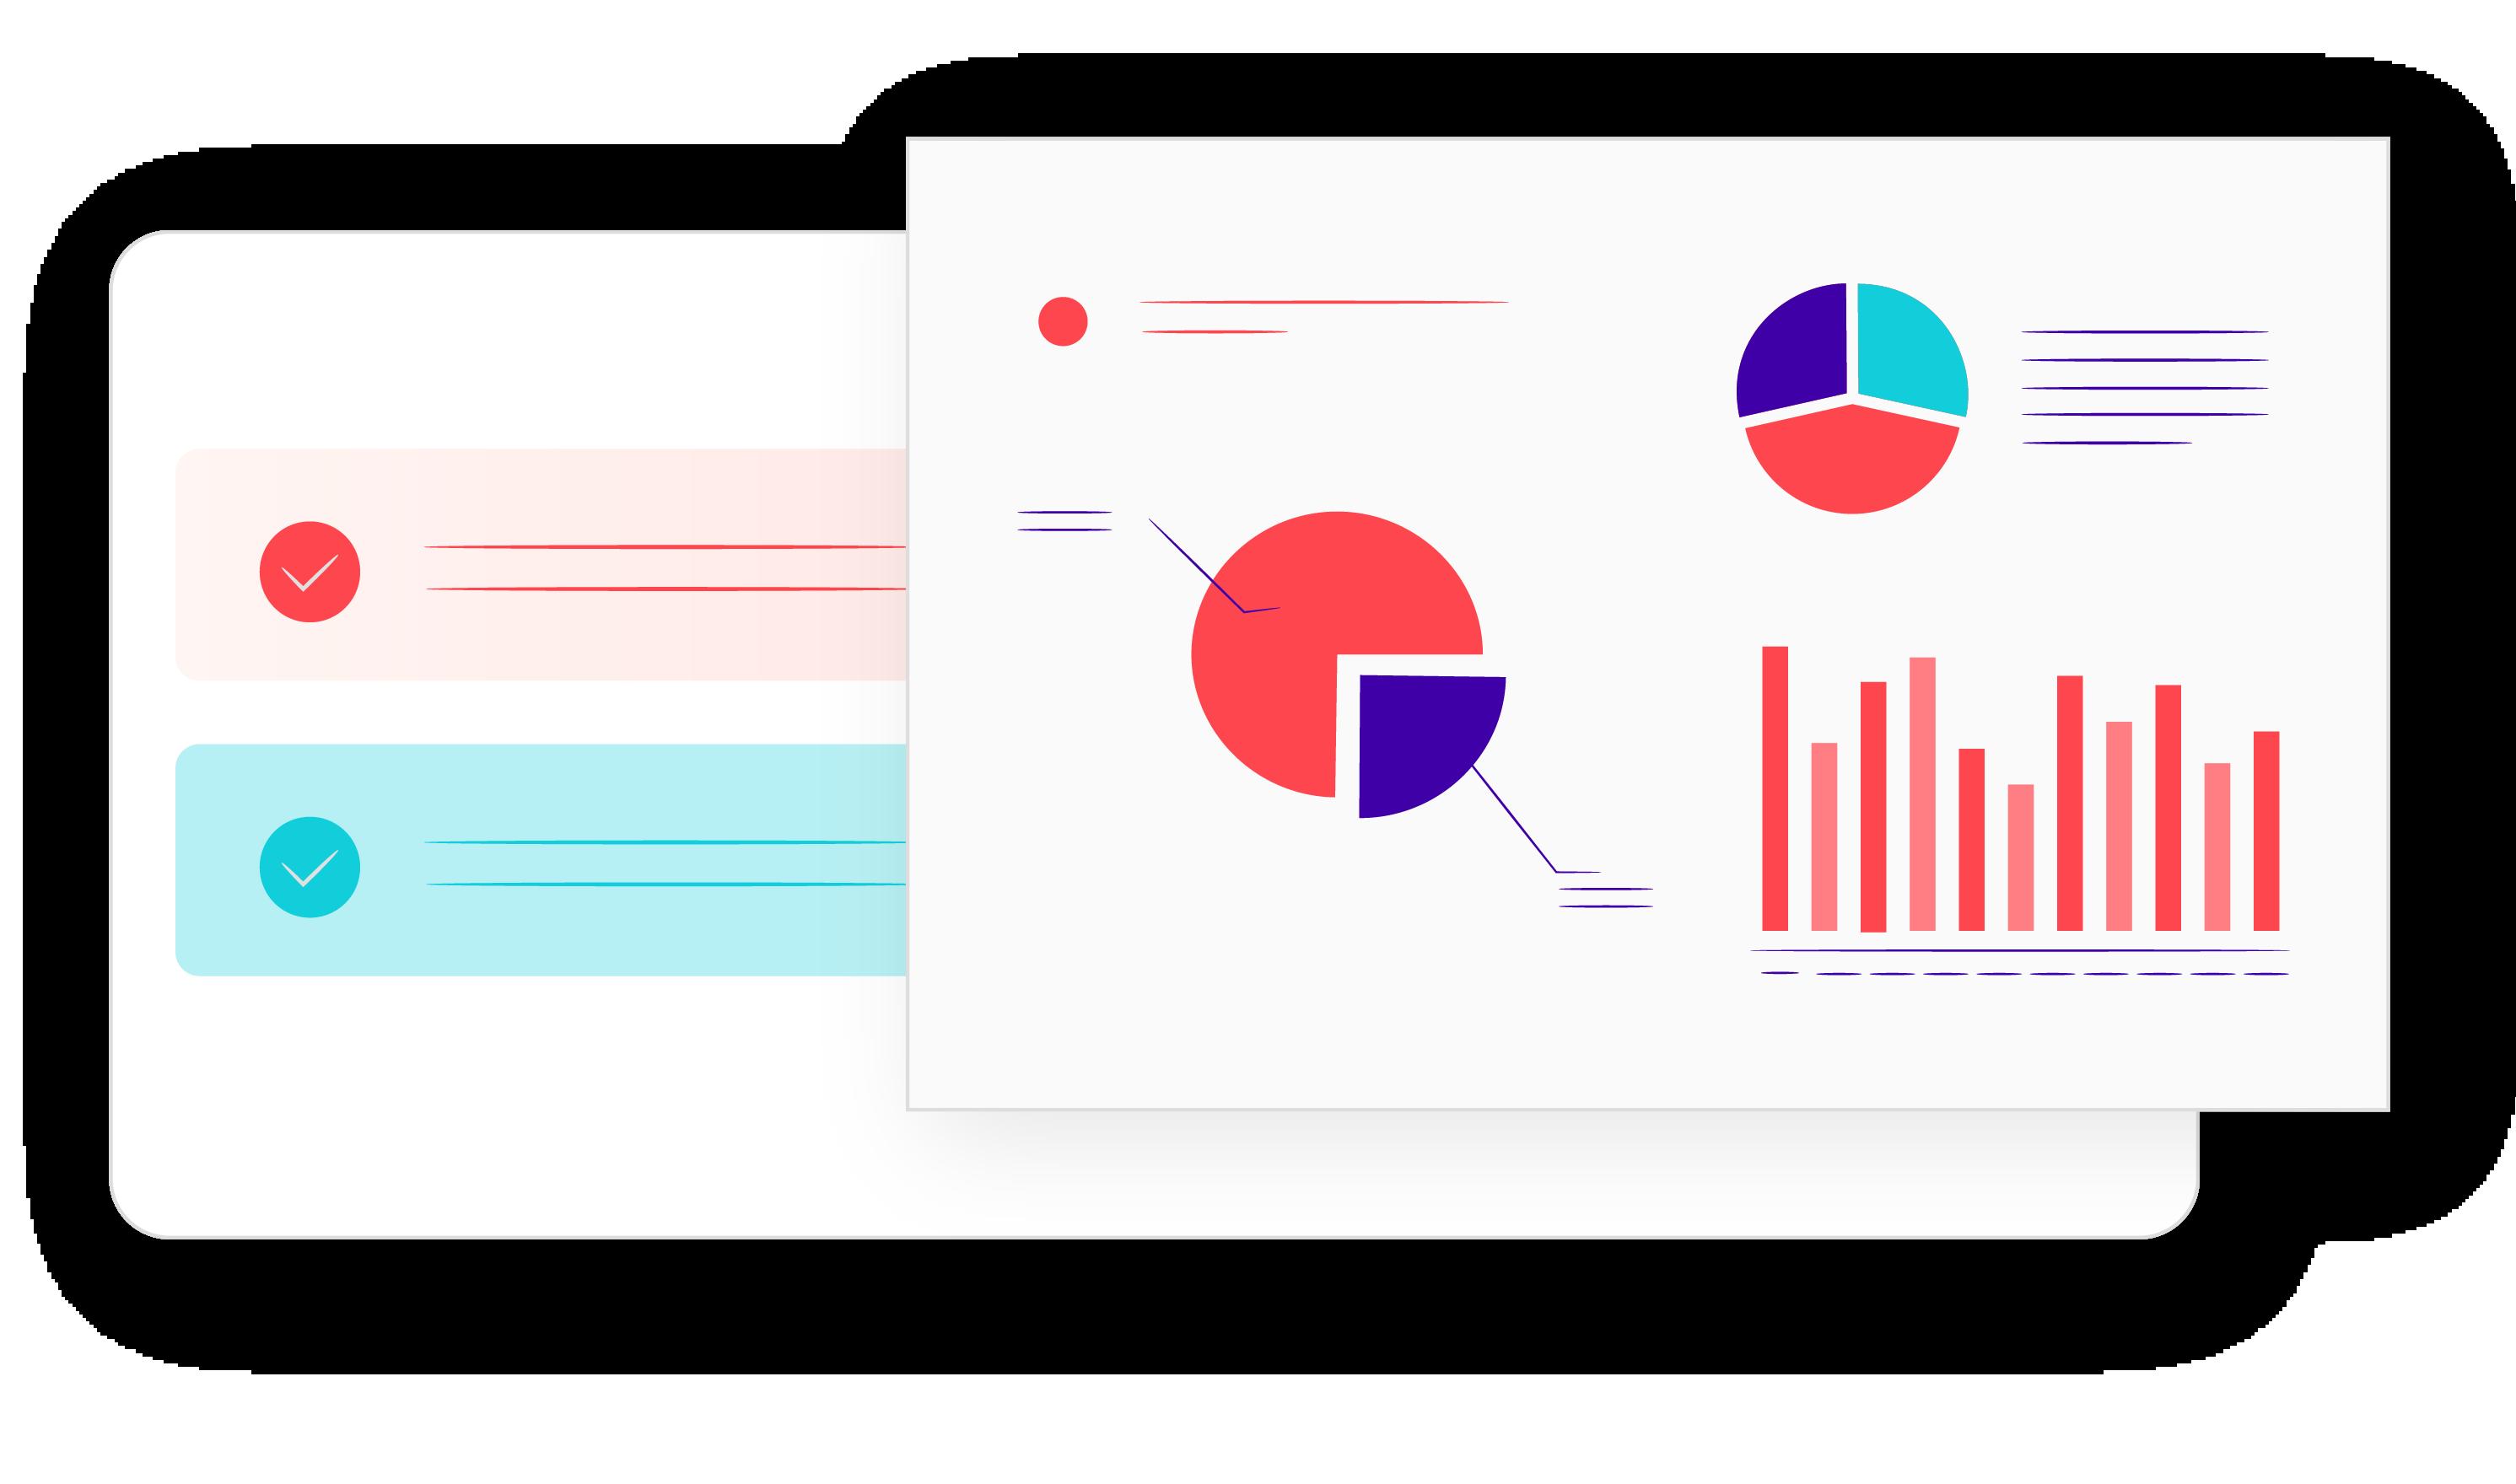 pie graph displaying data